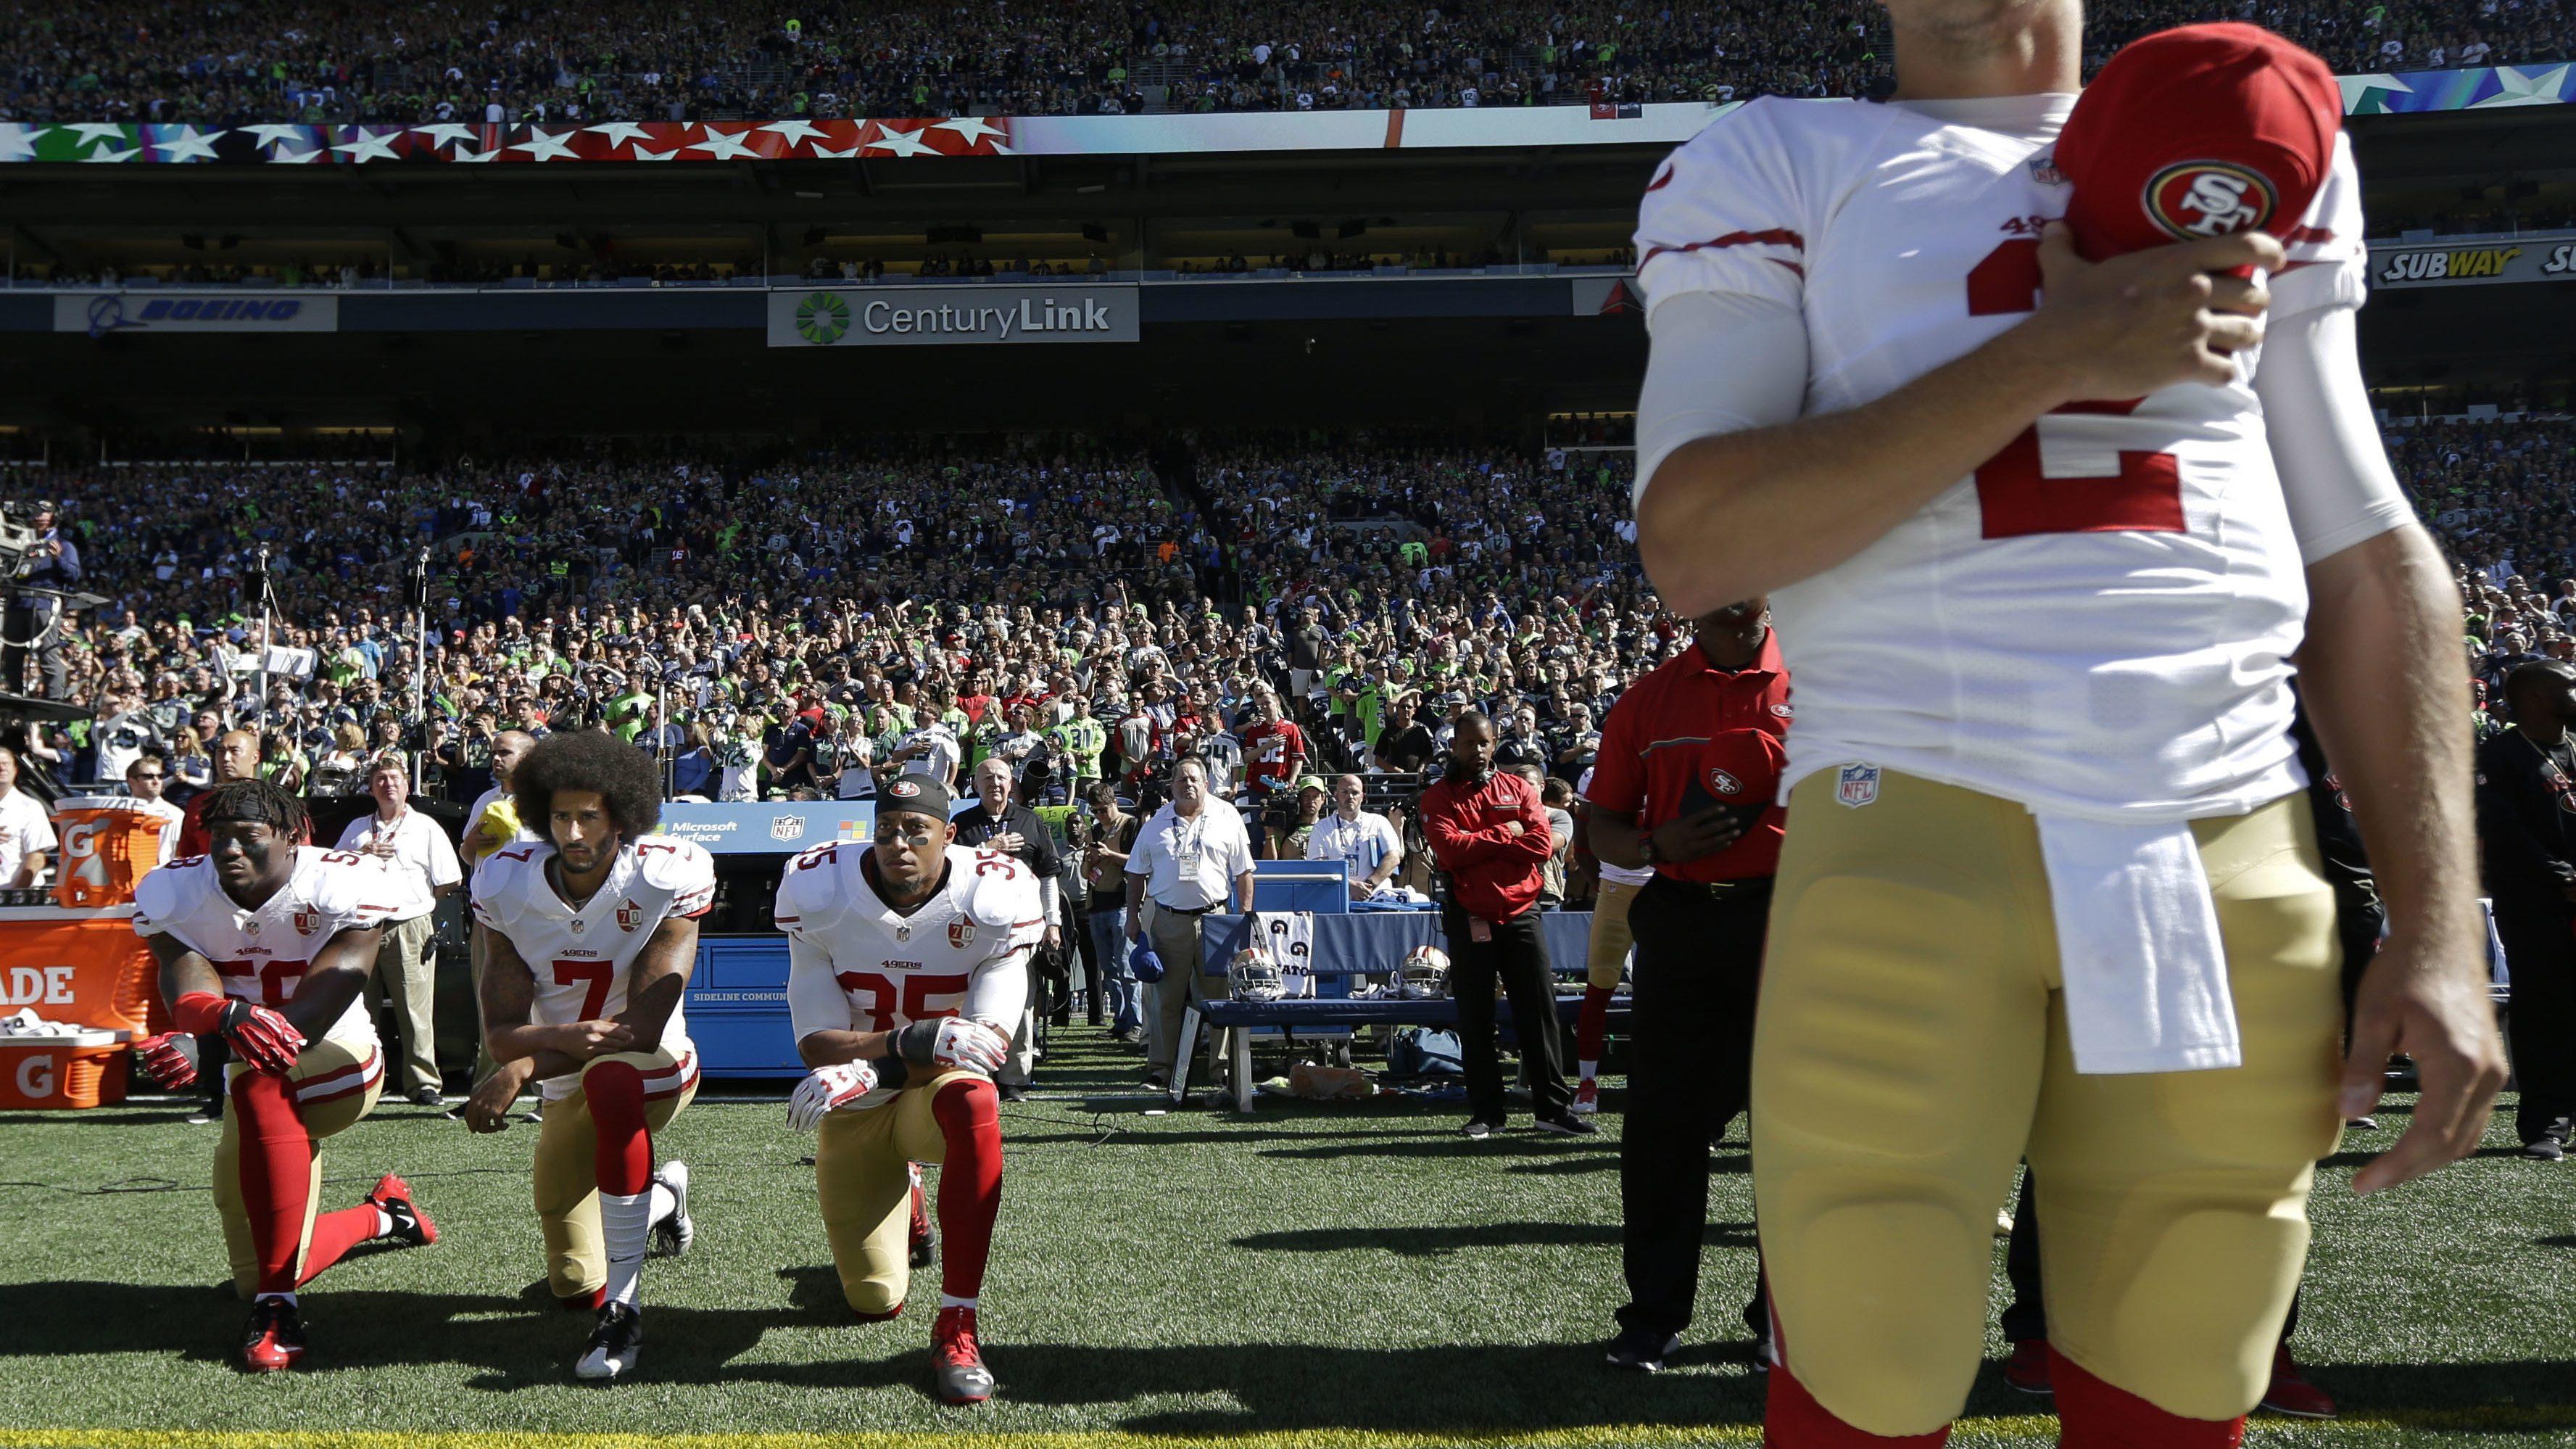 NFL San Francisco 49ers Eli Harold (58), Colin Kaepernick (7) and Eric Reid (35) kneel during the national anthem